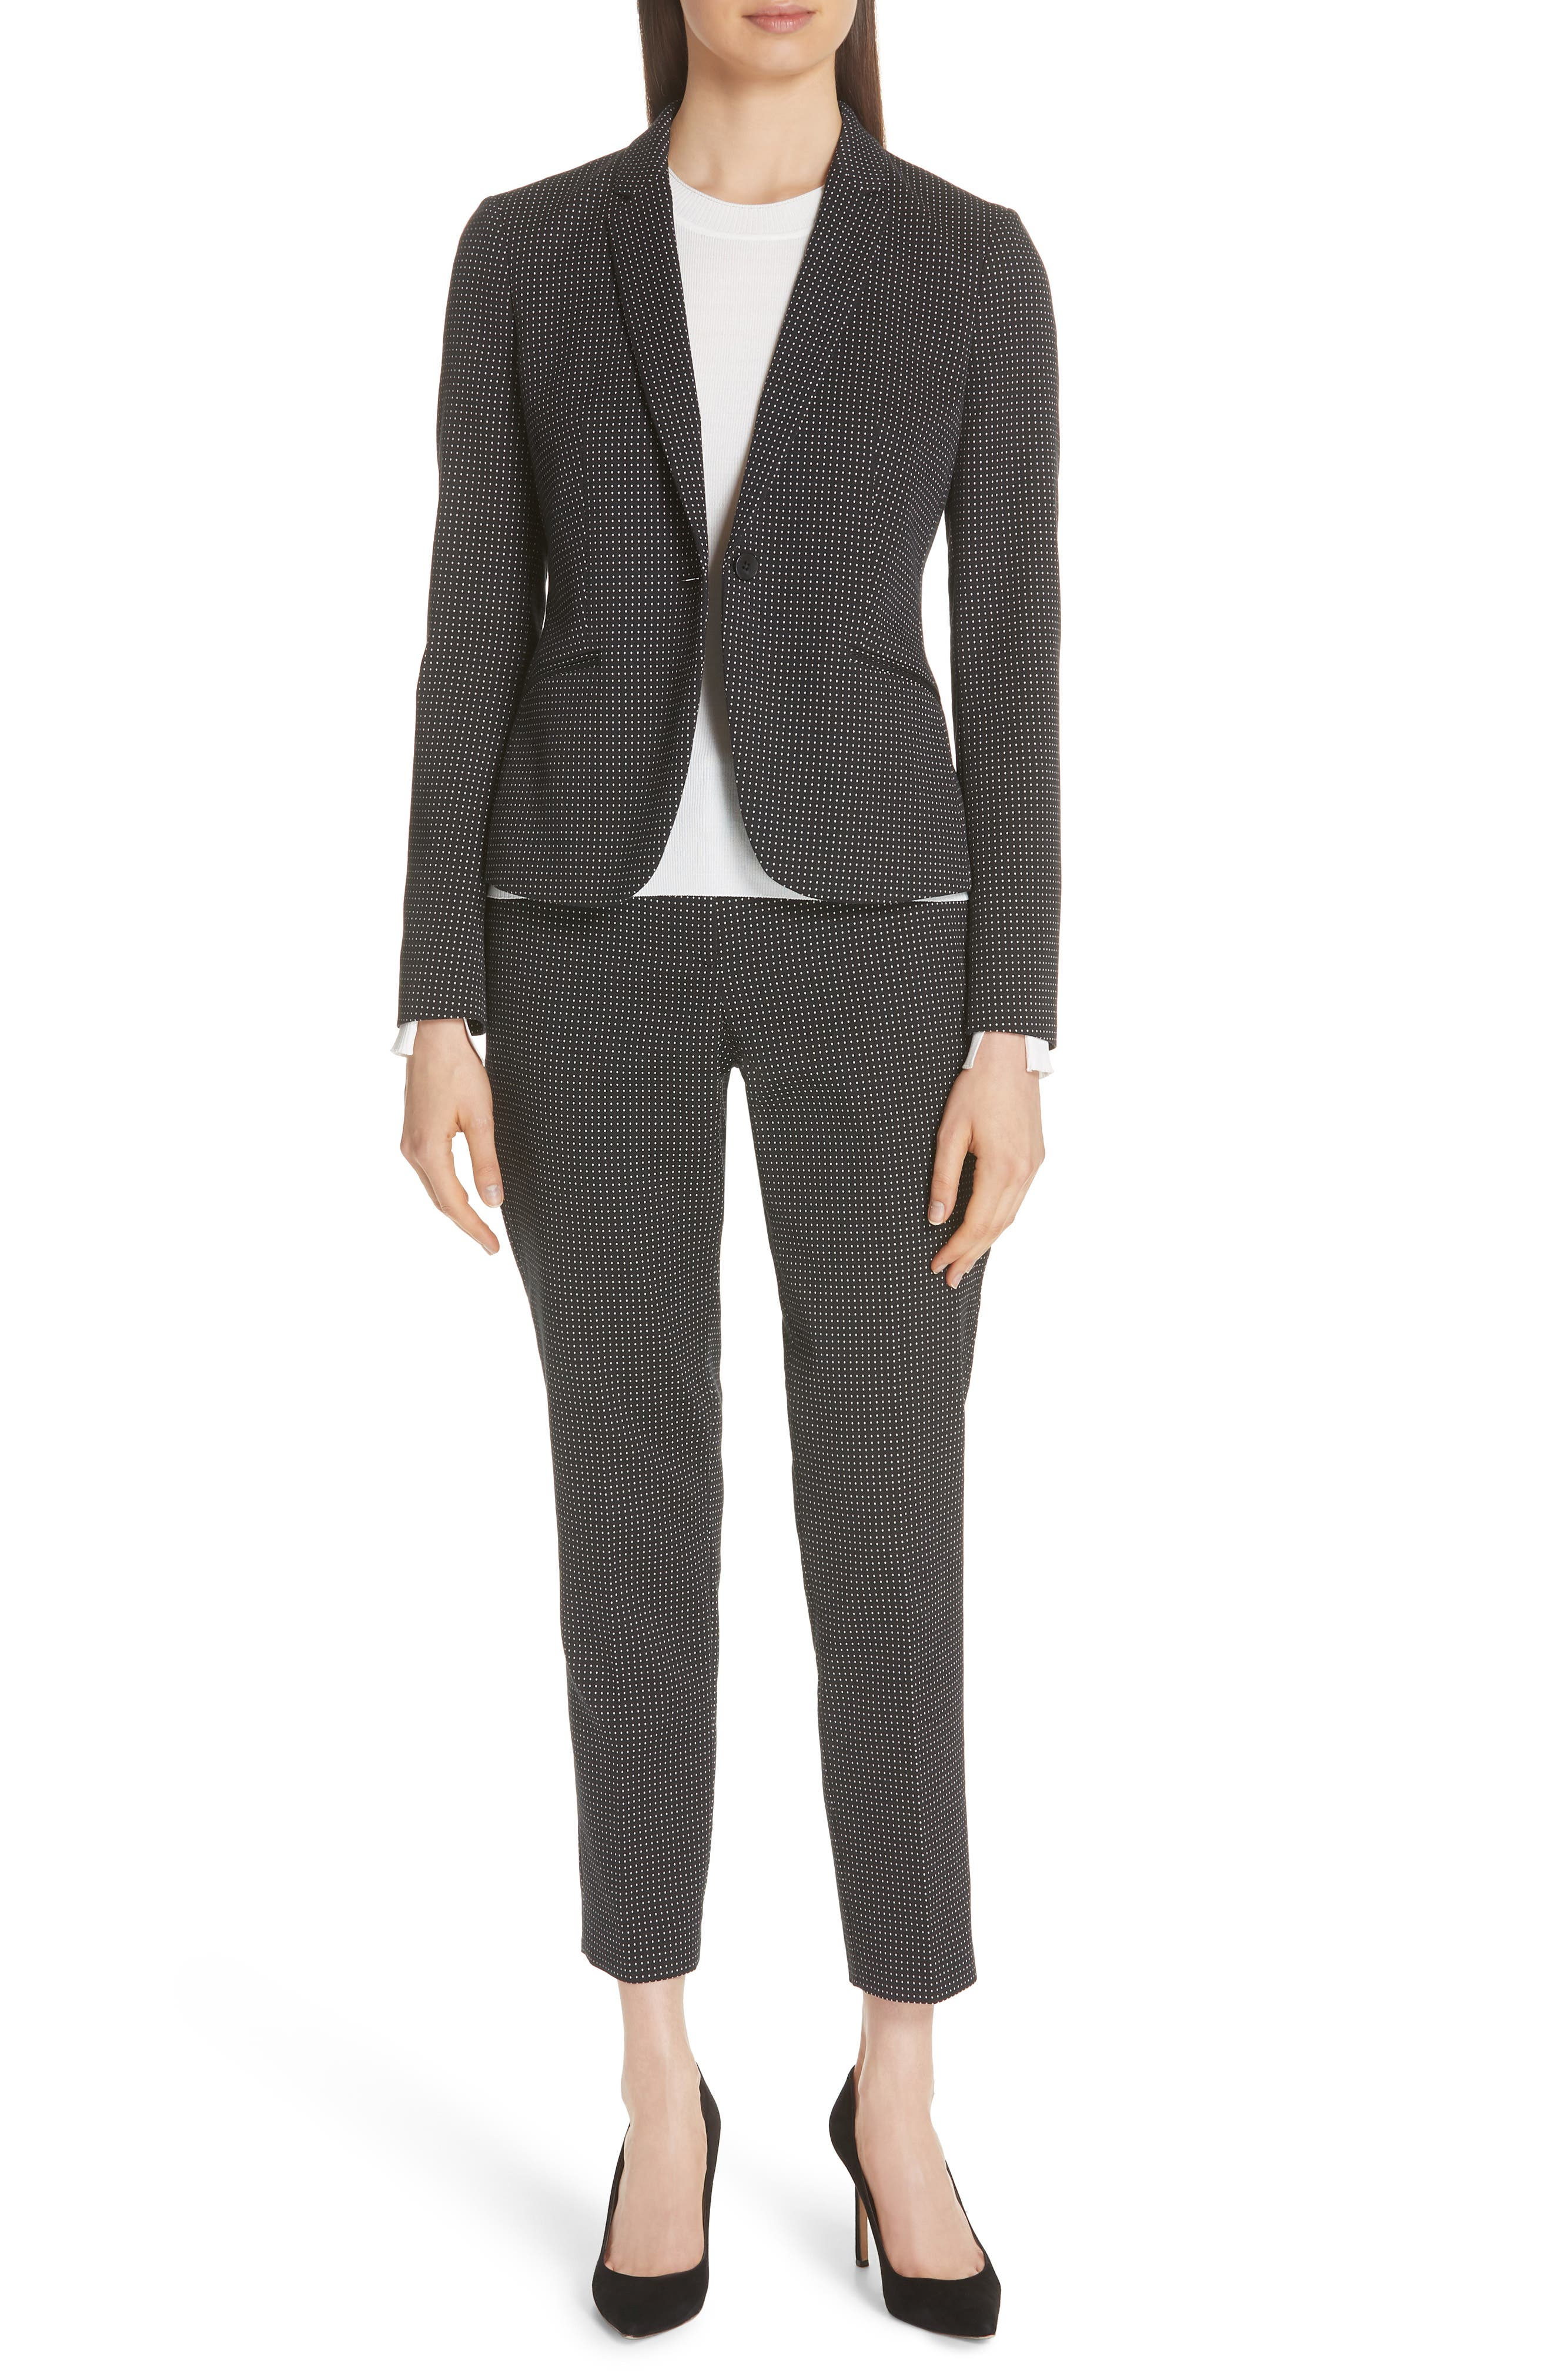 Tanitea Mini Dot Stretch Wool Suit Trousers,                             Alternate thumbnail 7, color,                             BLACK FANTASY